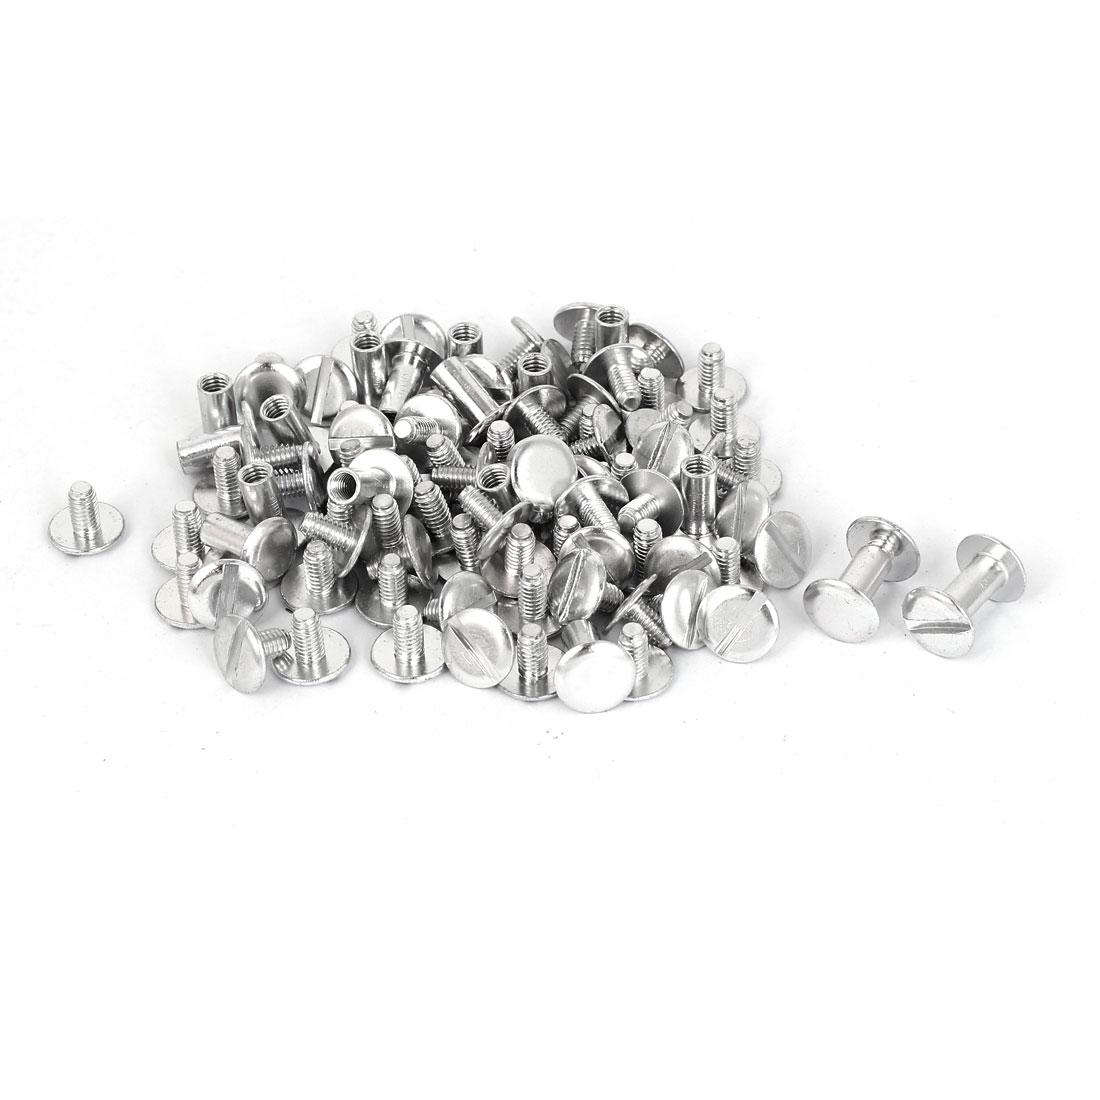 M5x10mm Aluminum Chicago Screws Binding Posts Silver Tone 50pcs